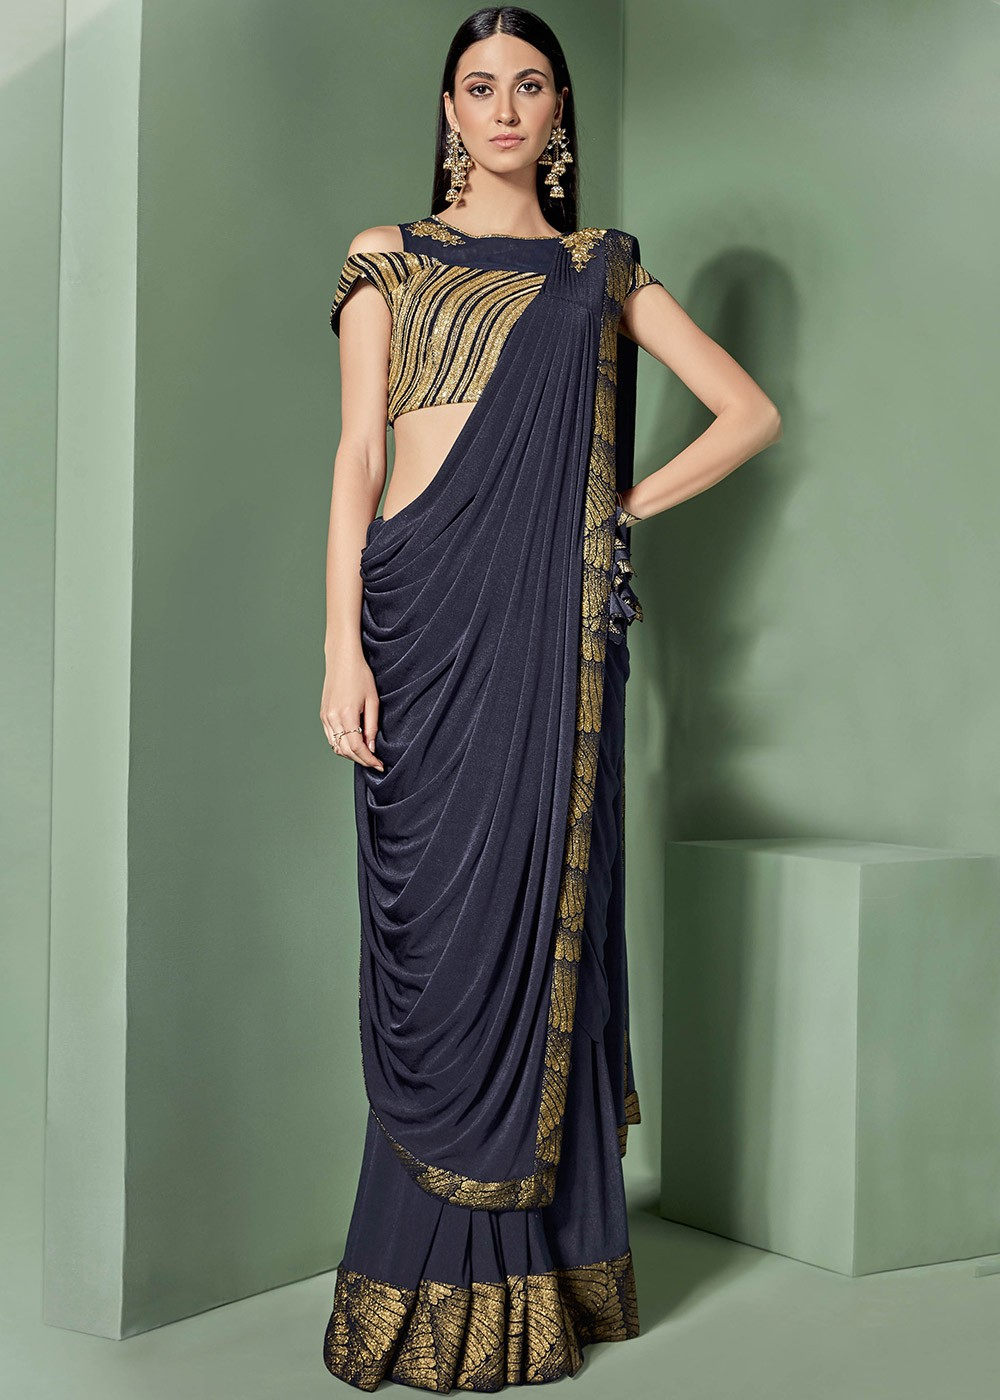 sequence blouse Georgette saree fancy blouse black blouse saree blouse gold foil patti saree yellow saree